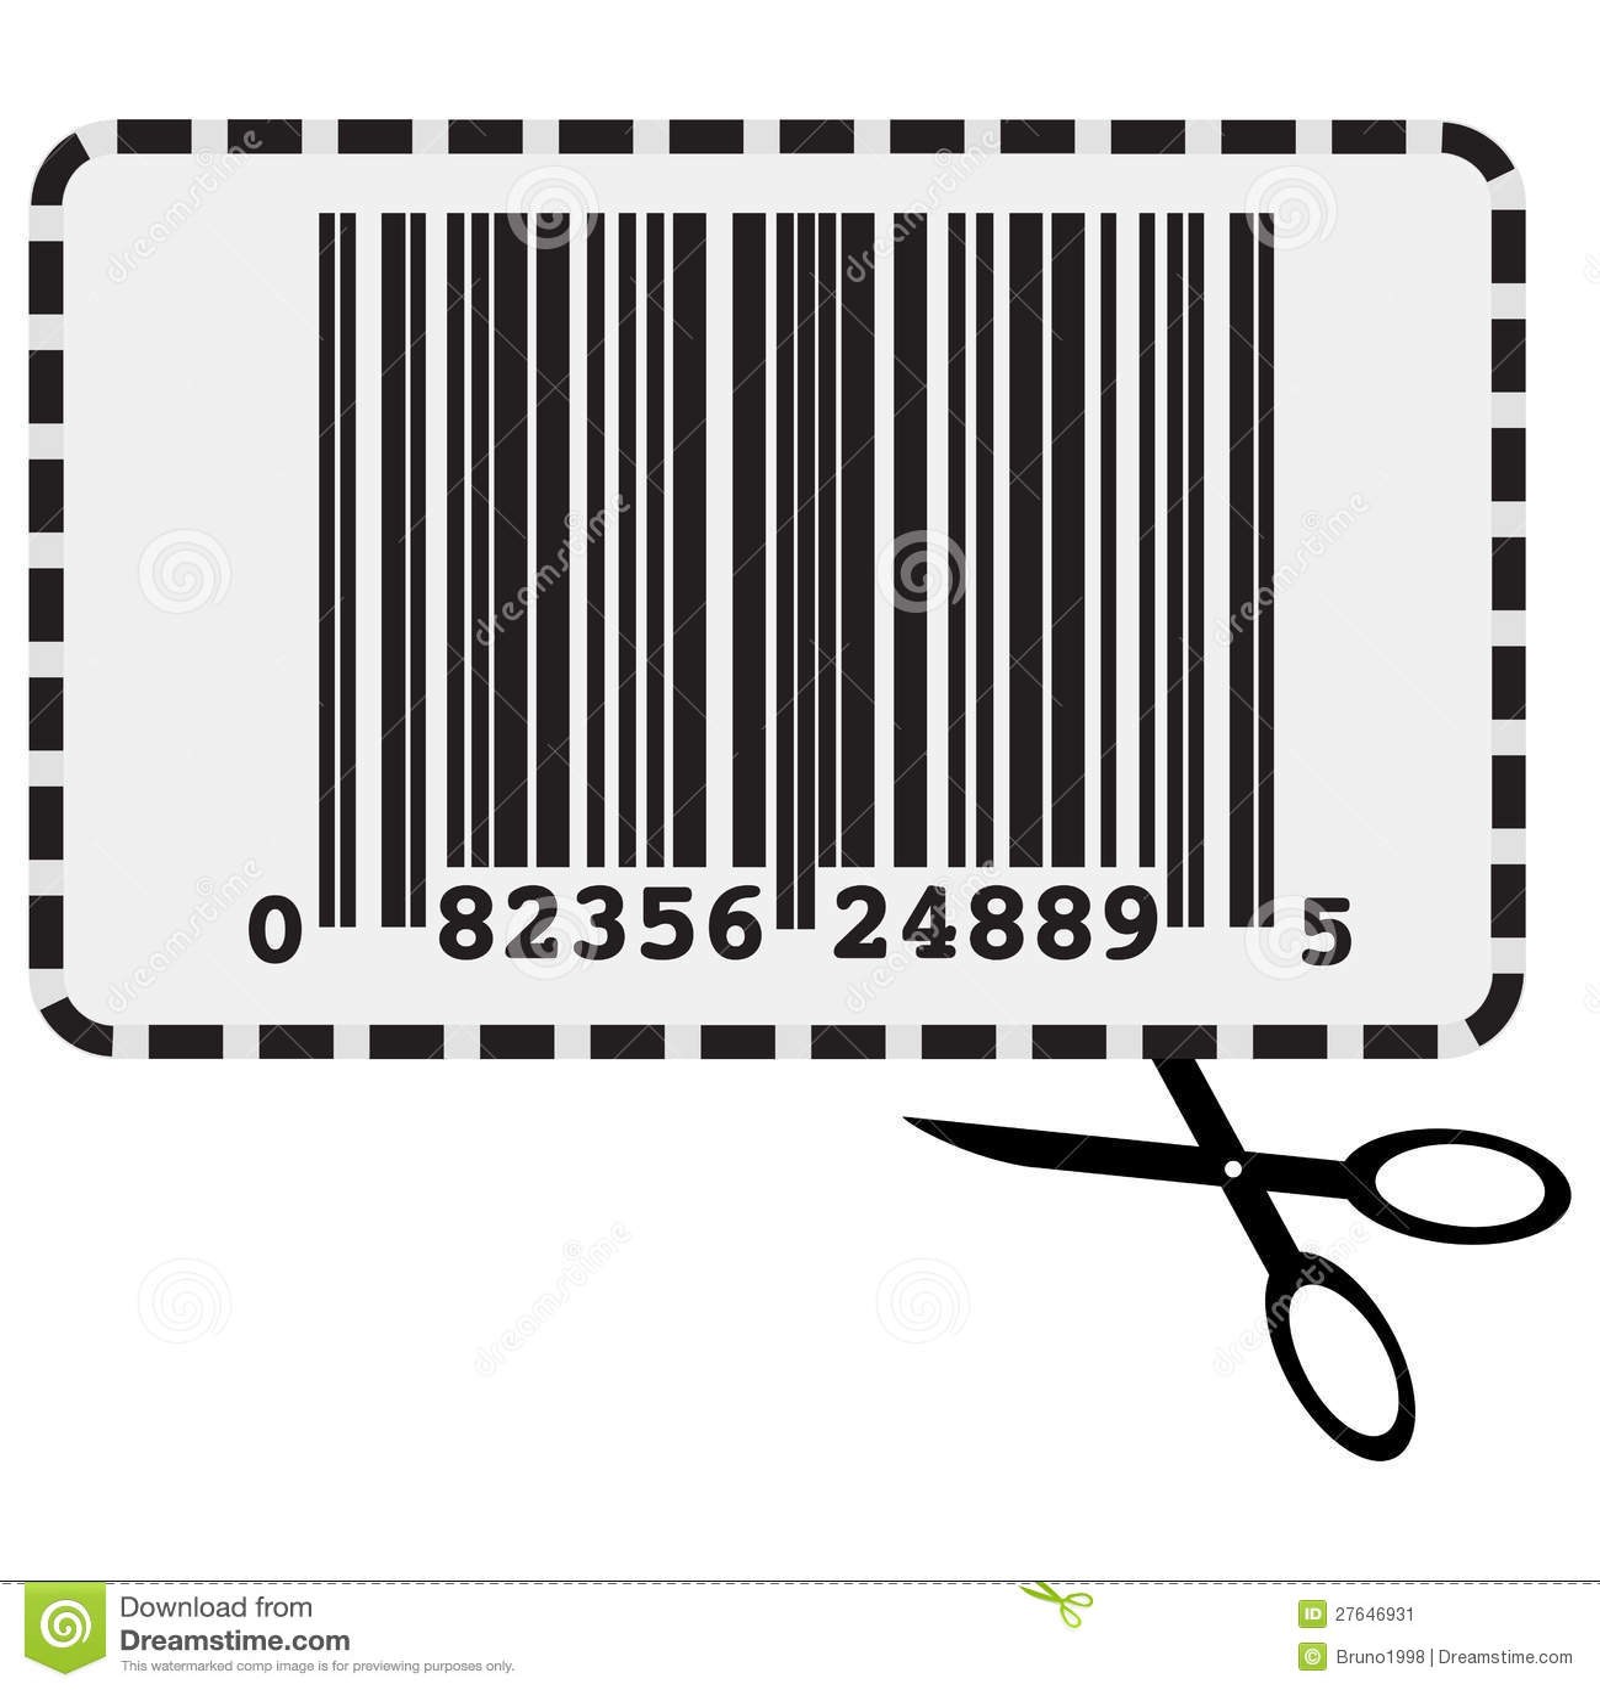 proof-purchase-27646931.jpg